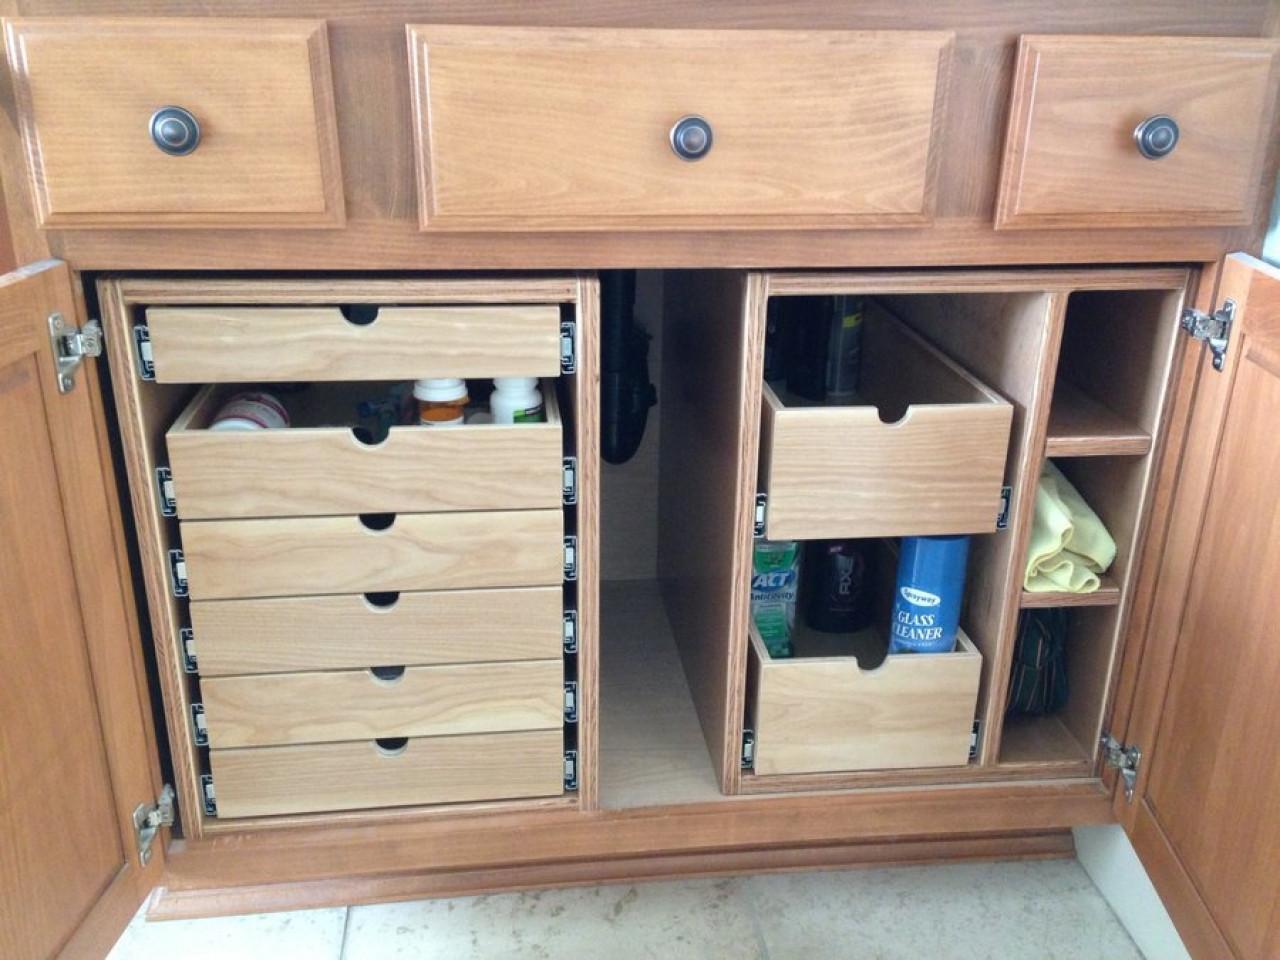 Best ideas about Bathroom Cabinet Storage . Save or Pin Bathroom vanity organizer bathroom tray organizer vanity Now.